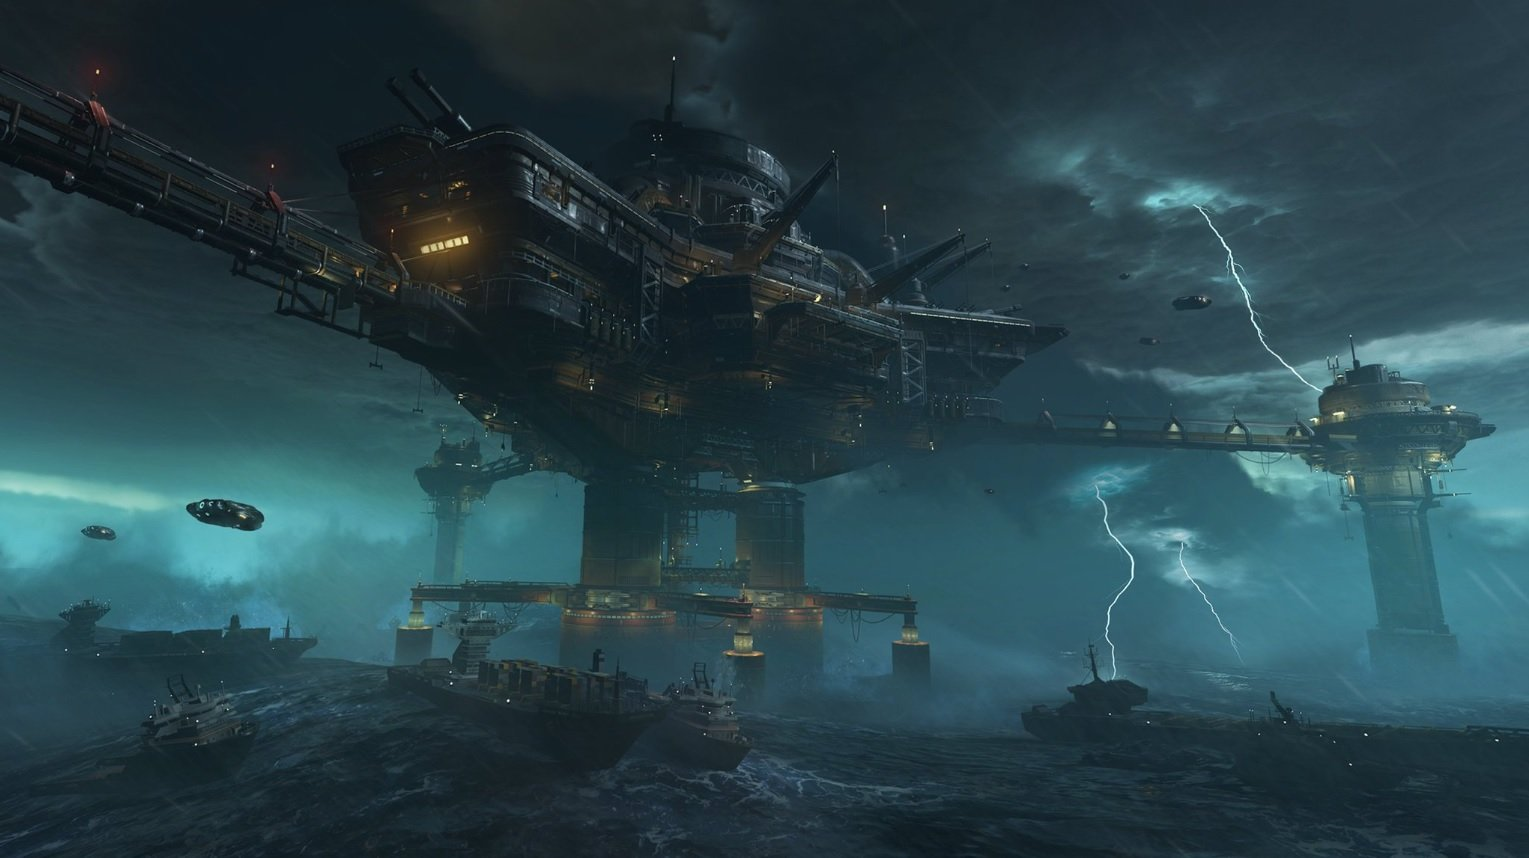 Doom Eternal DLC screenshots have no demons or violence, so how can we be sure it's Doom? screenshot